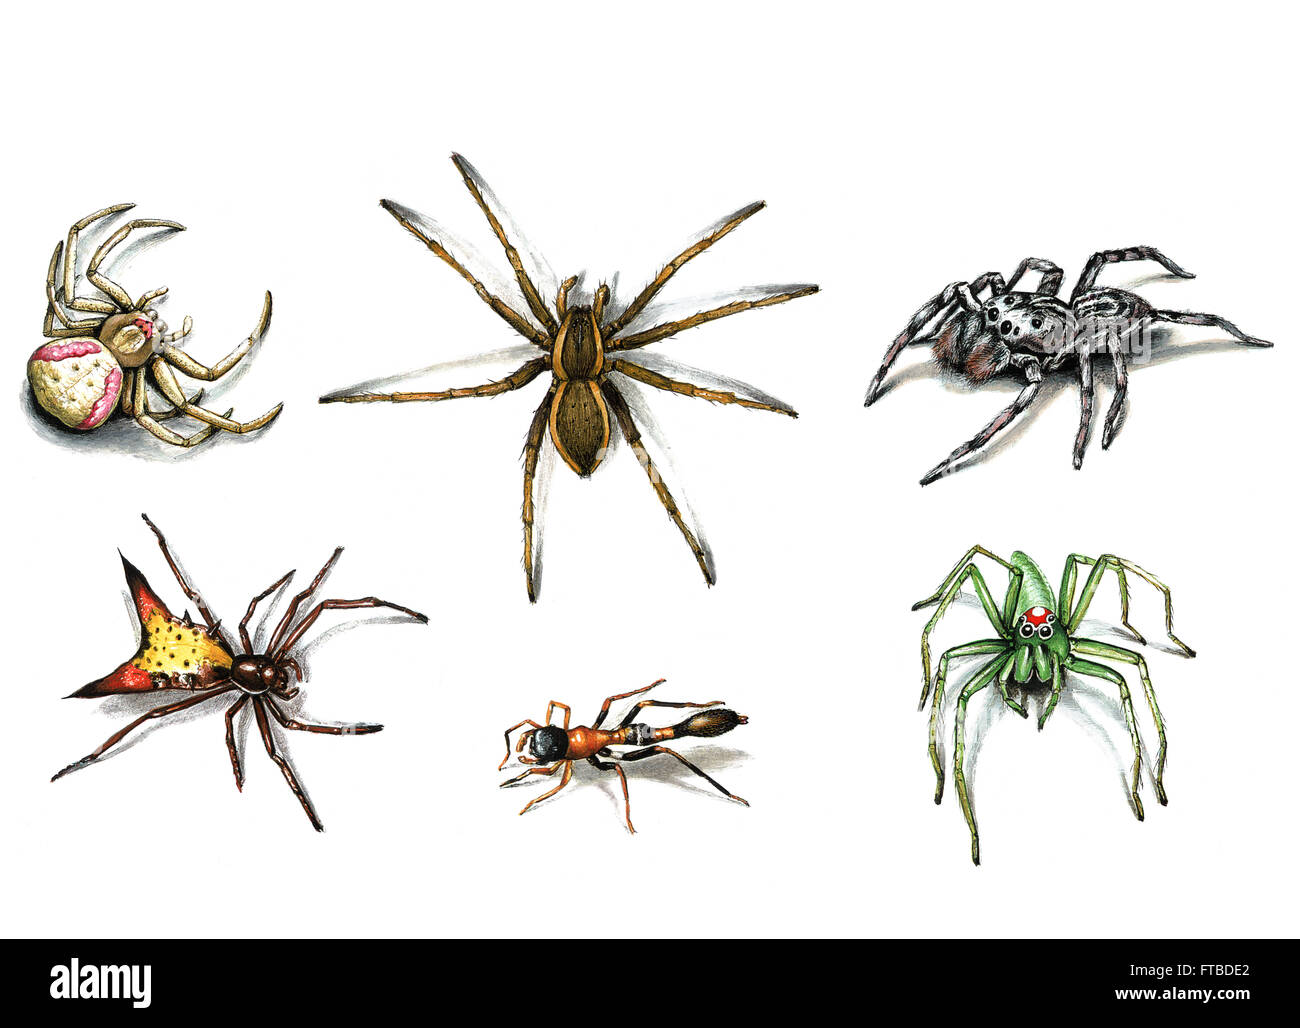 Illustration of arachnids by Bohdan Wroblewski - Stock Image